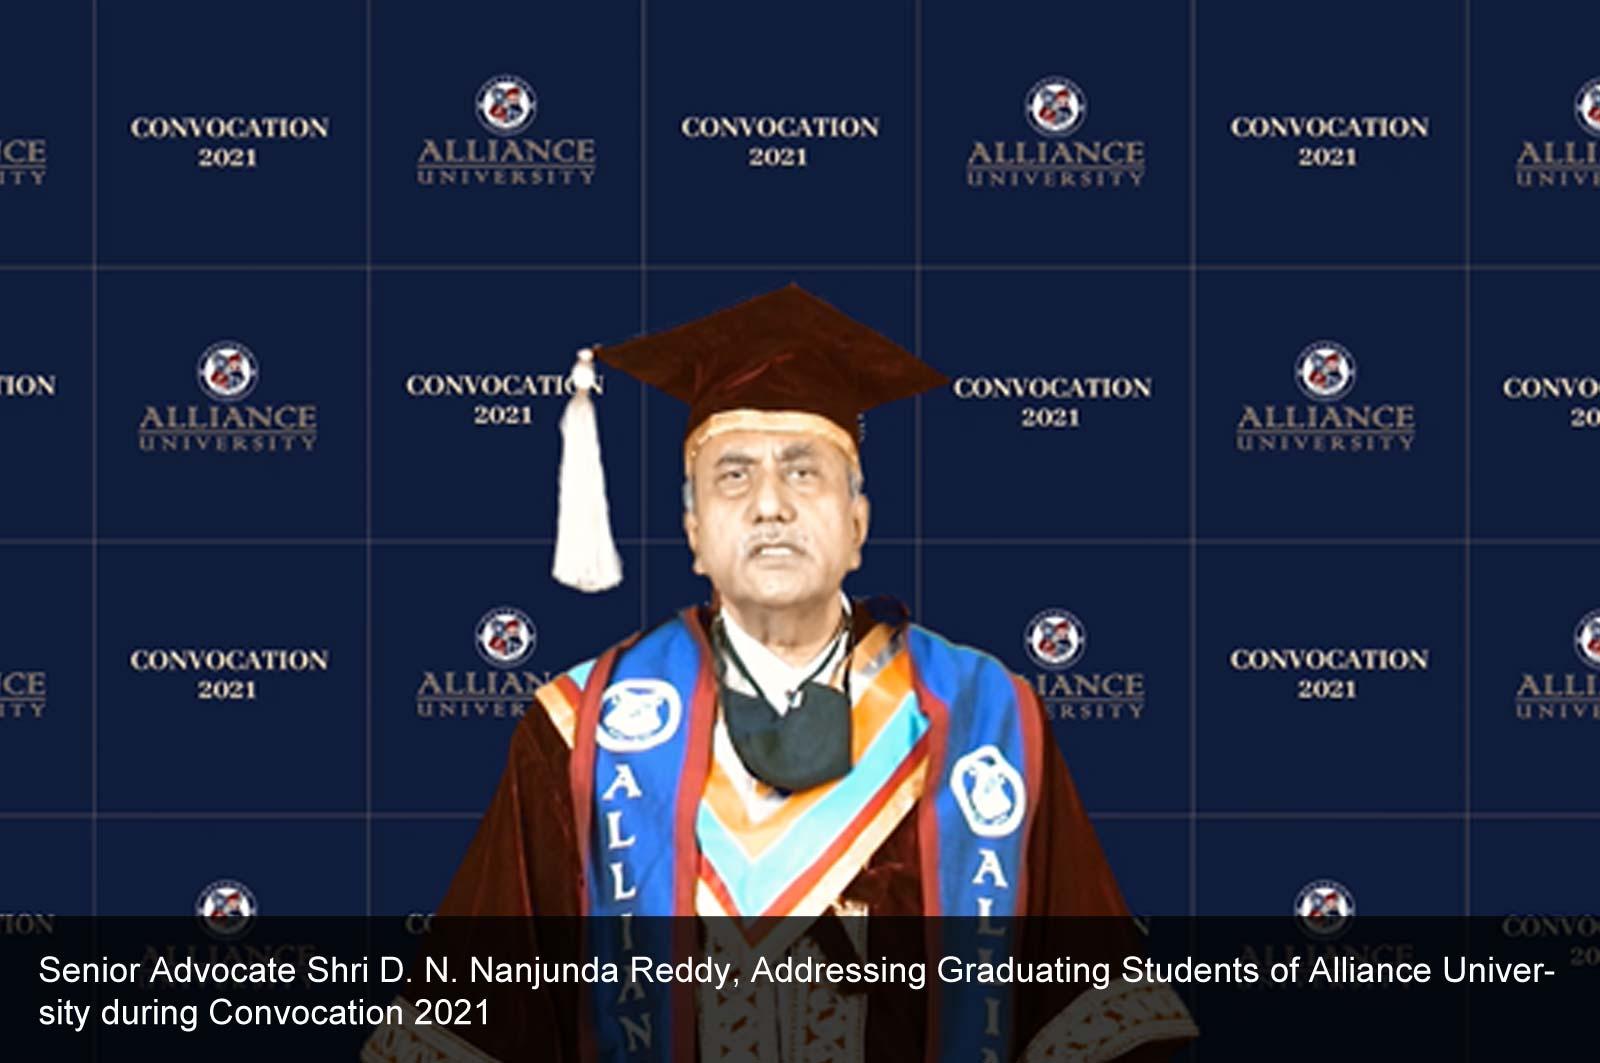 Convocation Address by Senior Advocate Shri D.N. Nanjunda Reddy on Convocation 2021